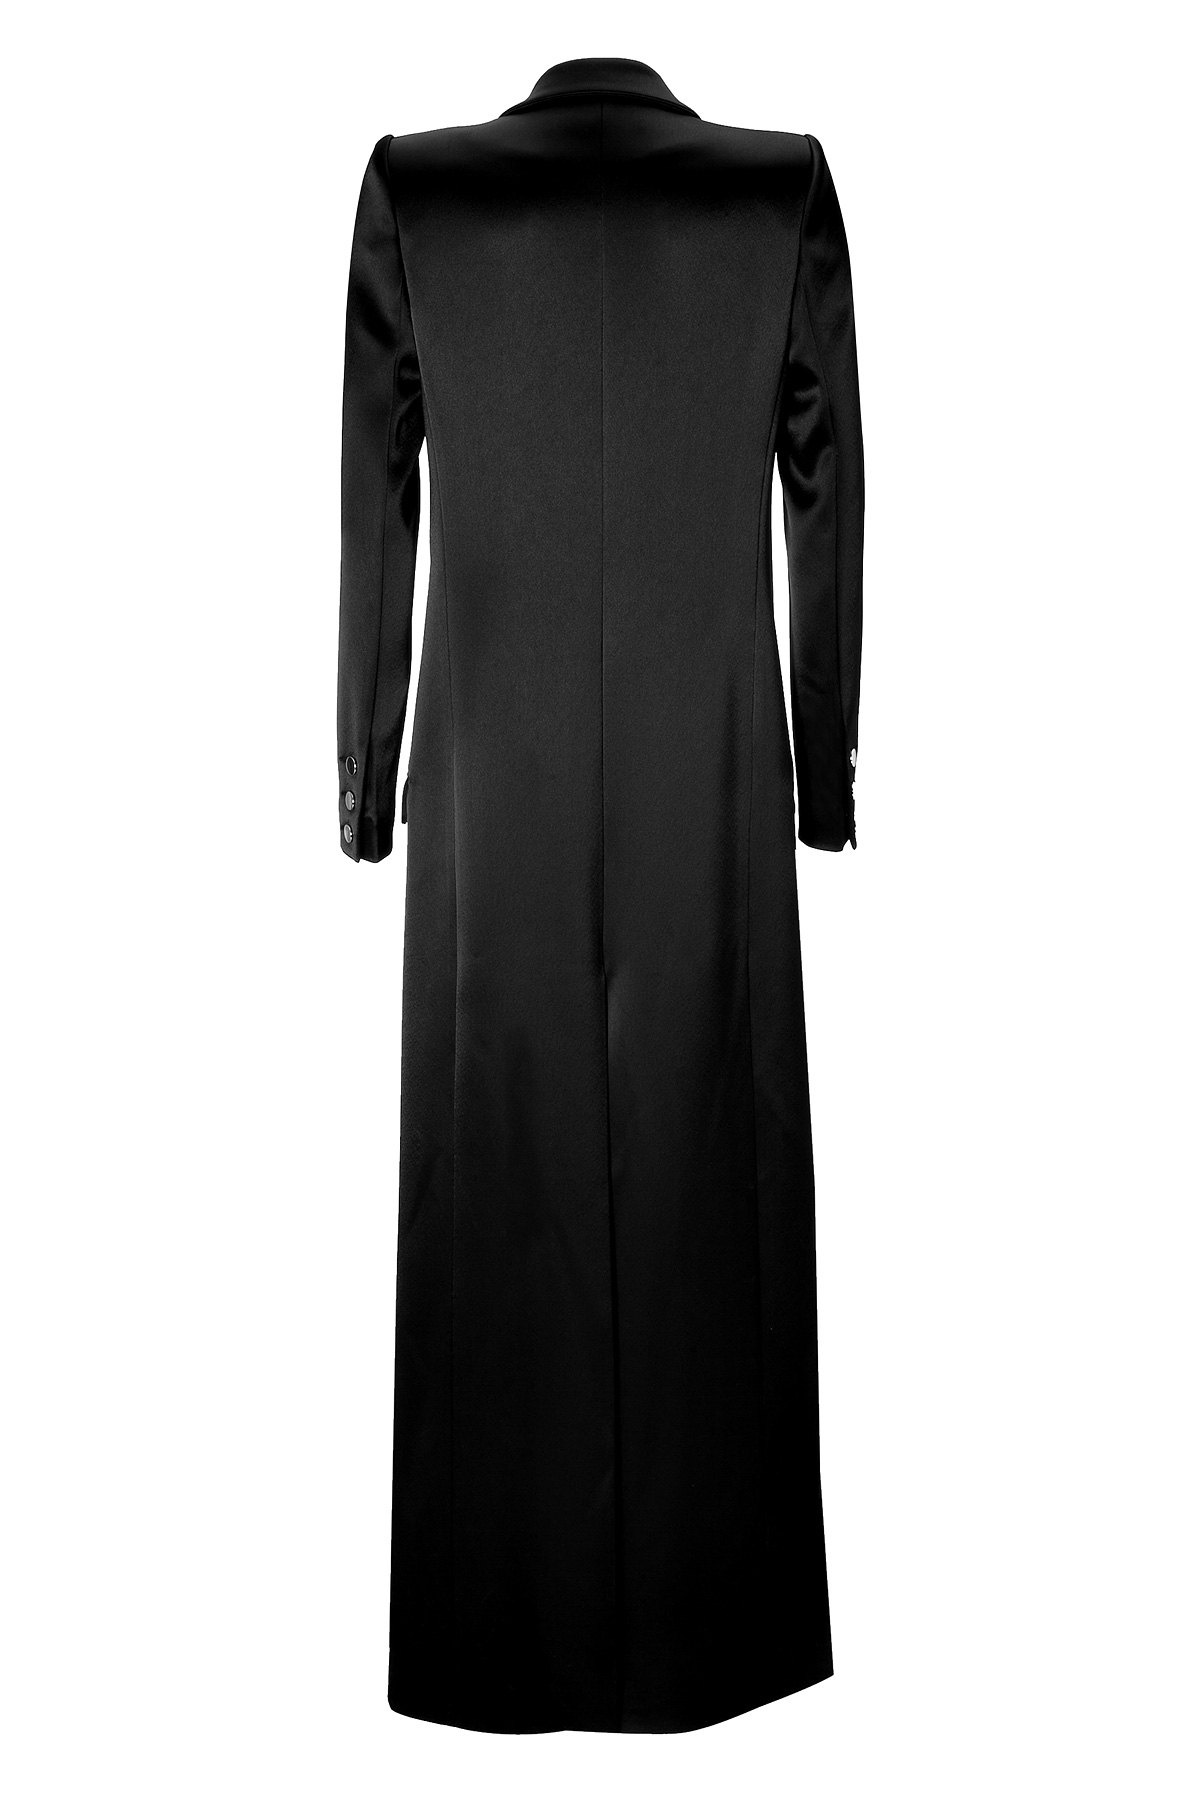 Lyst - Anthony Vaccarello Satin Floor-length Coat